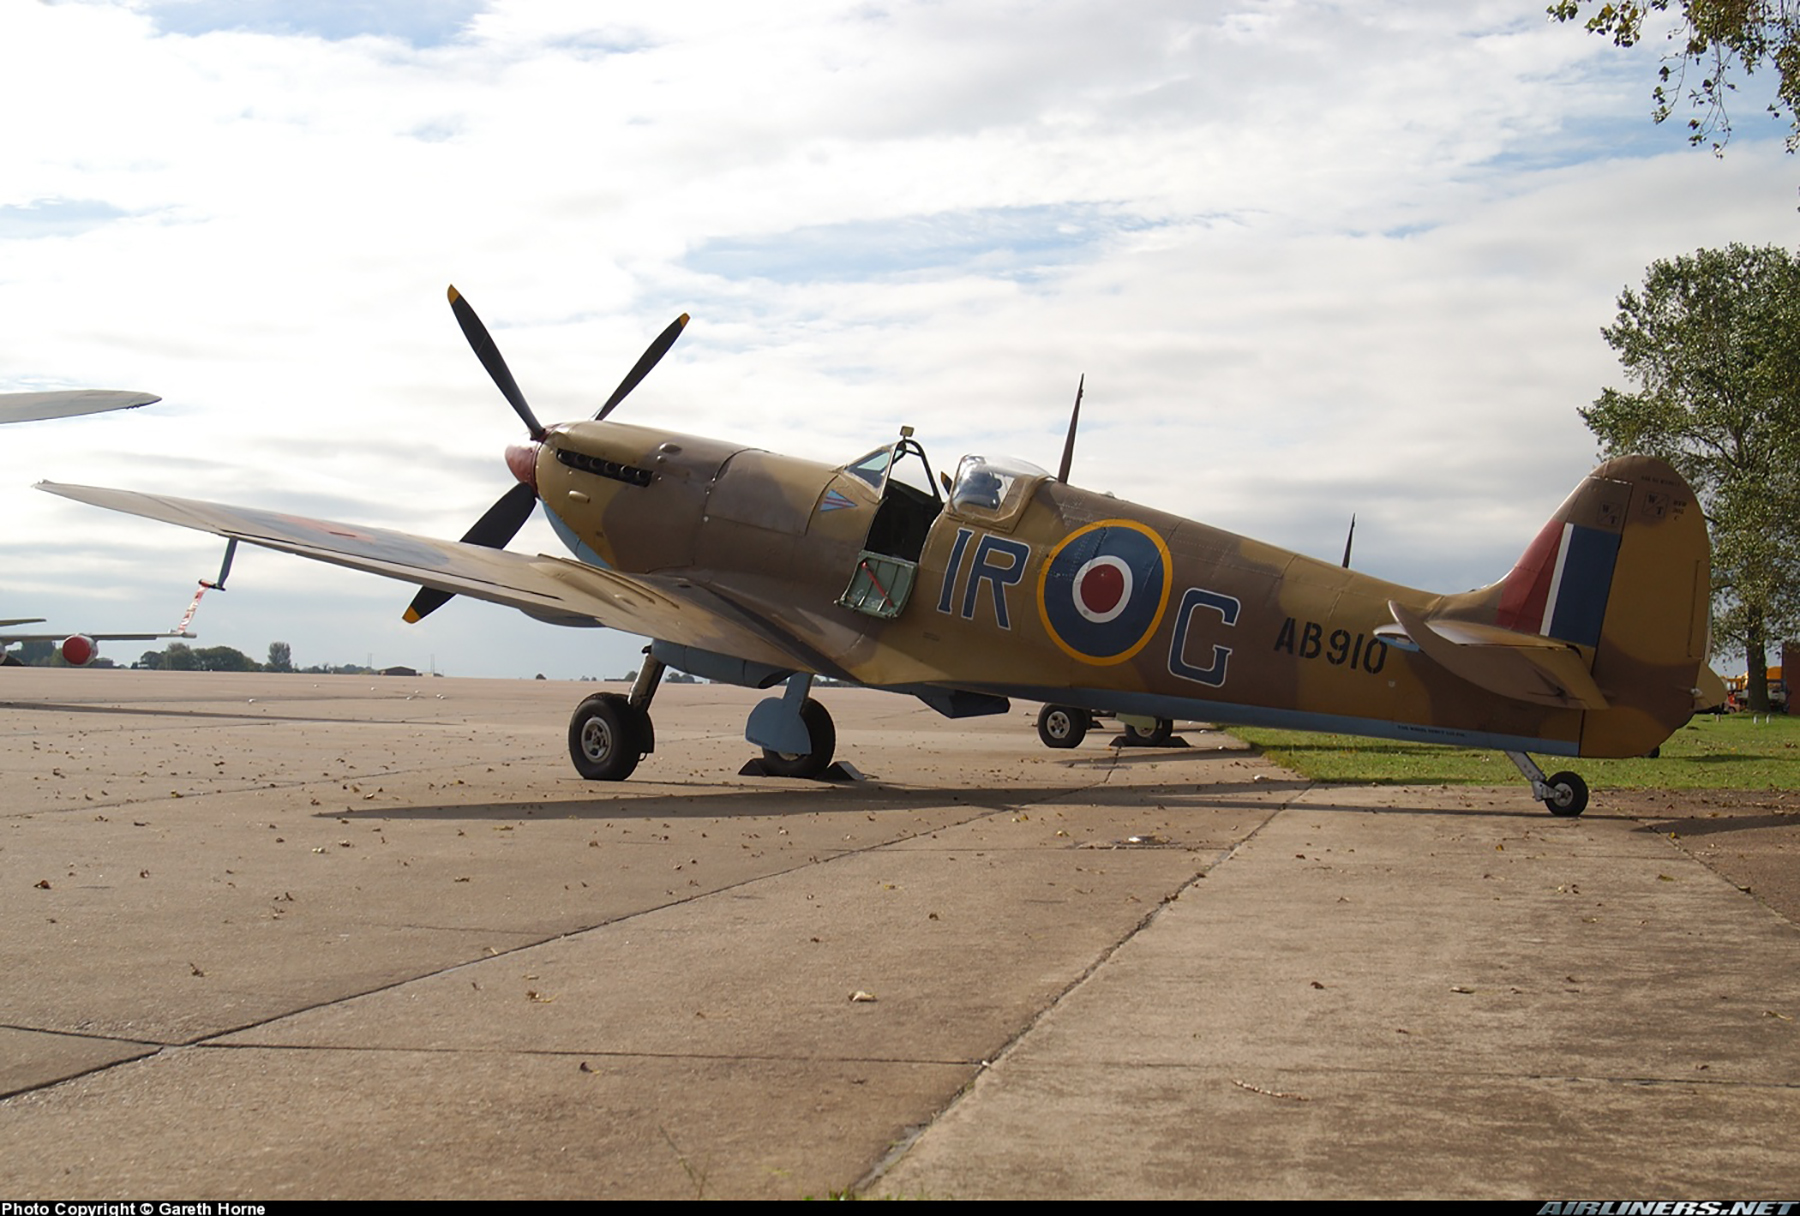 Airworthy Spitfire warbird RCAF 416Sqn IRG AB910 07